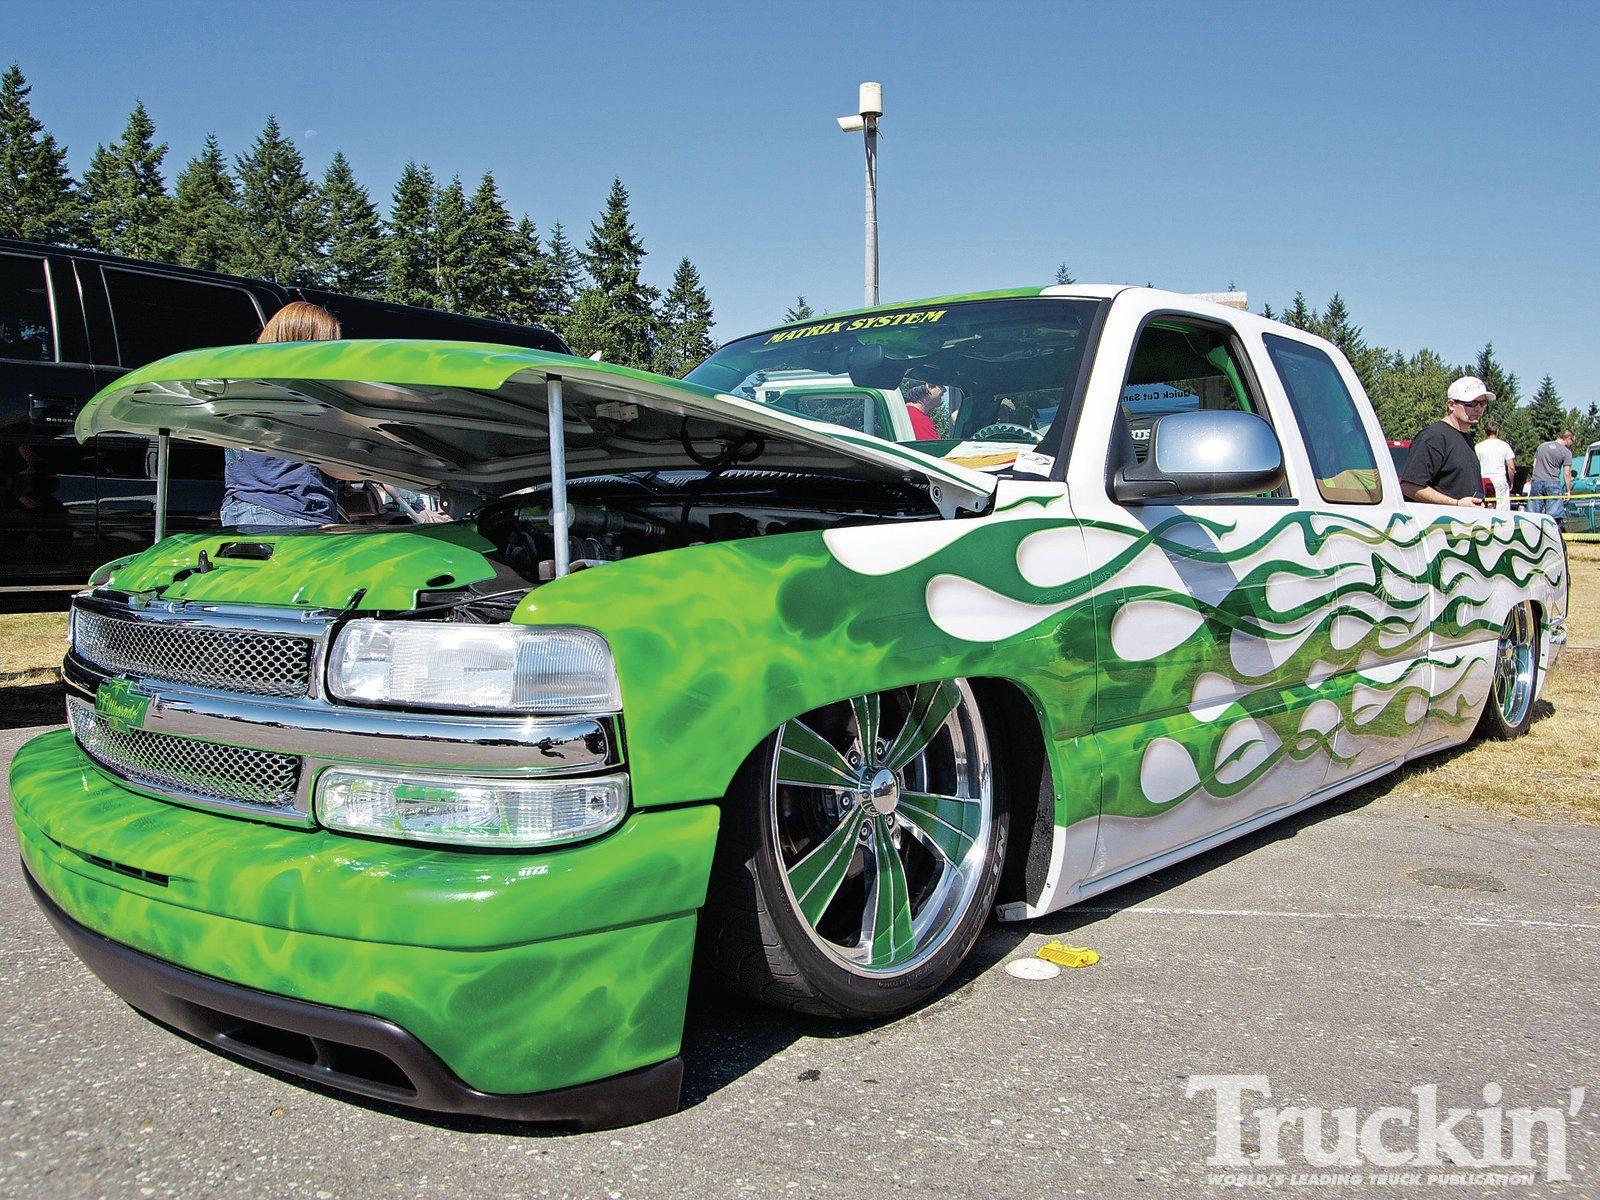 Chevy Silverado Custom Truck Green Flames HD Wallpaper | Custom ...